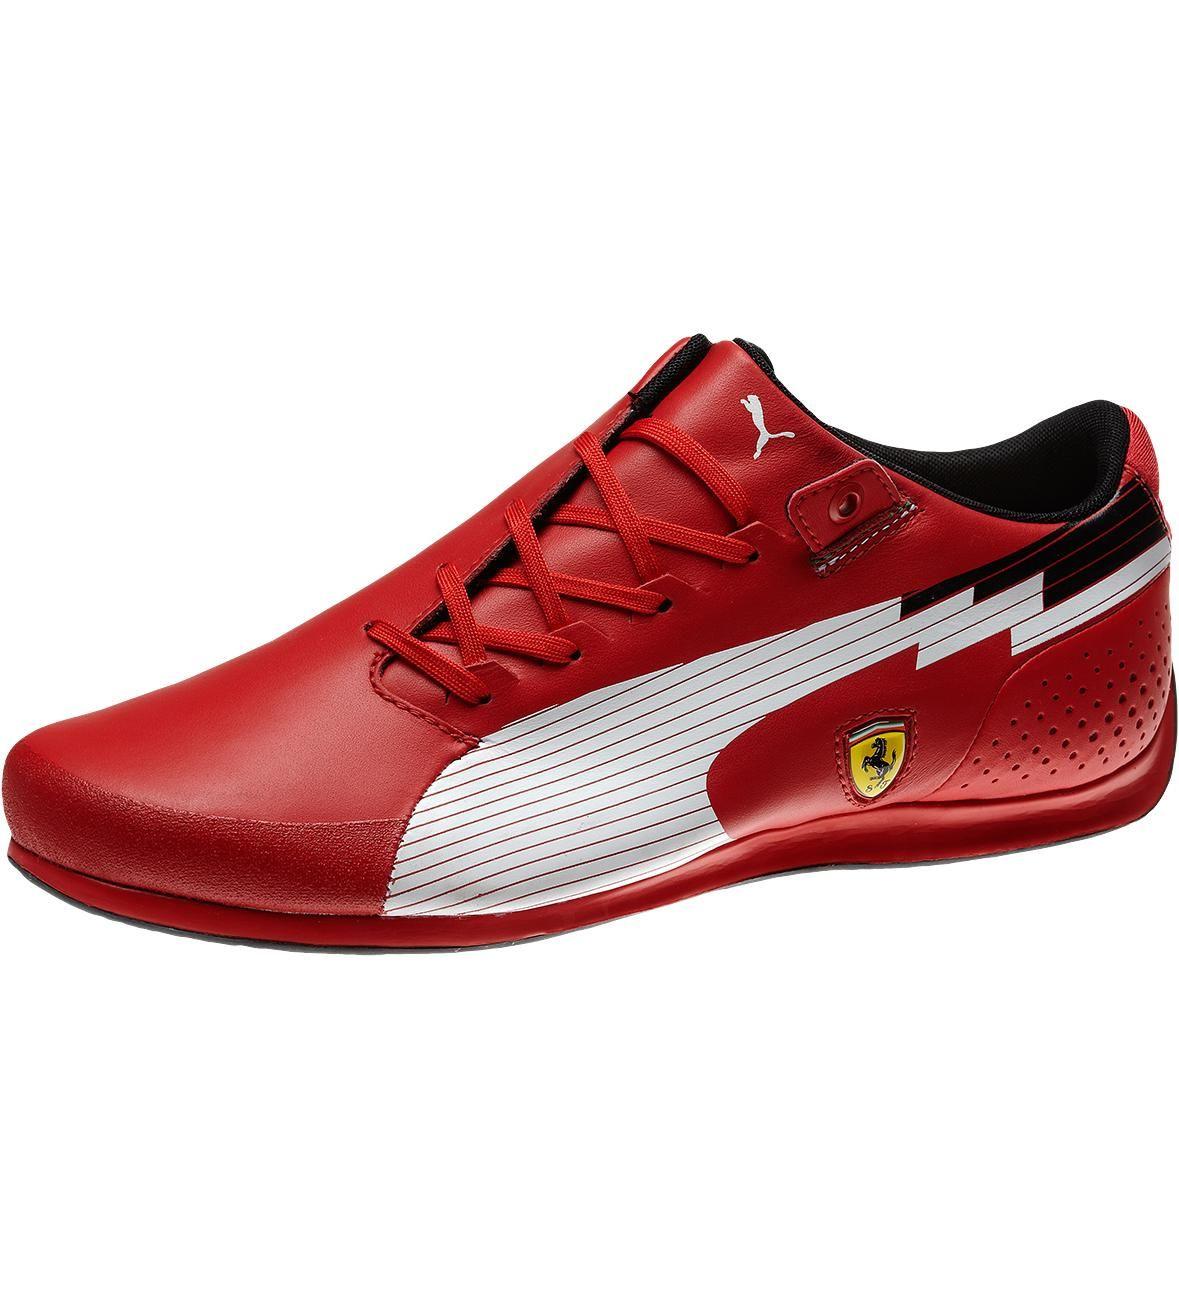 5774fba080f Ferrari evoSPEED Low Shoes.  110.00